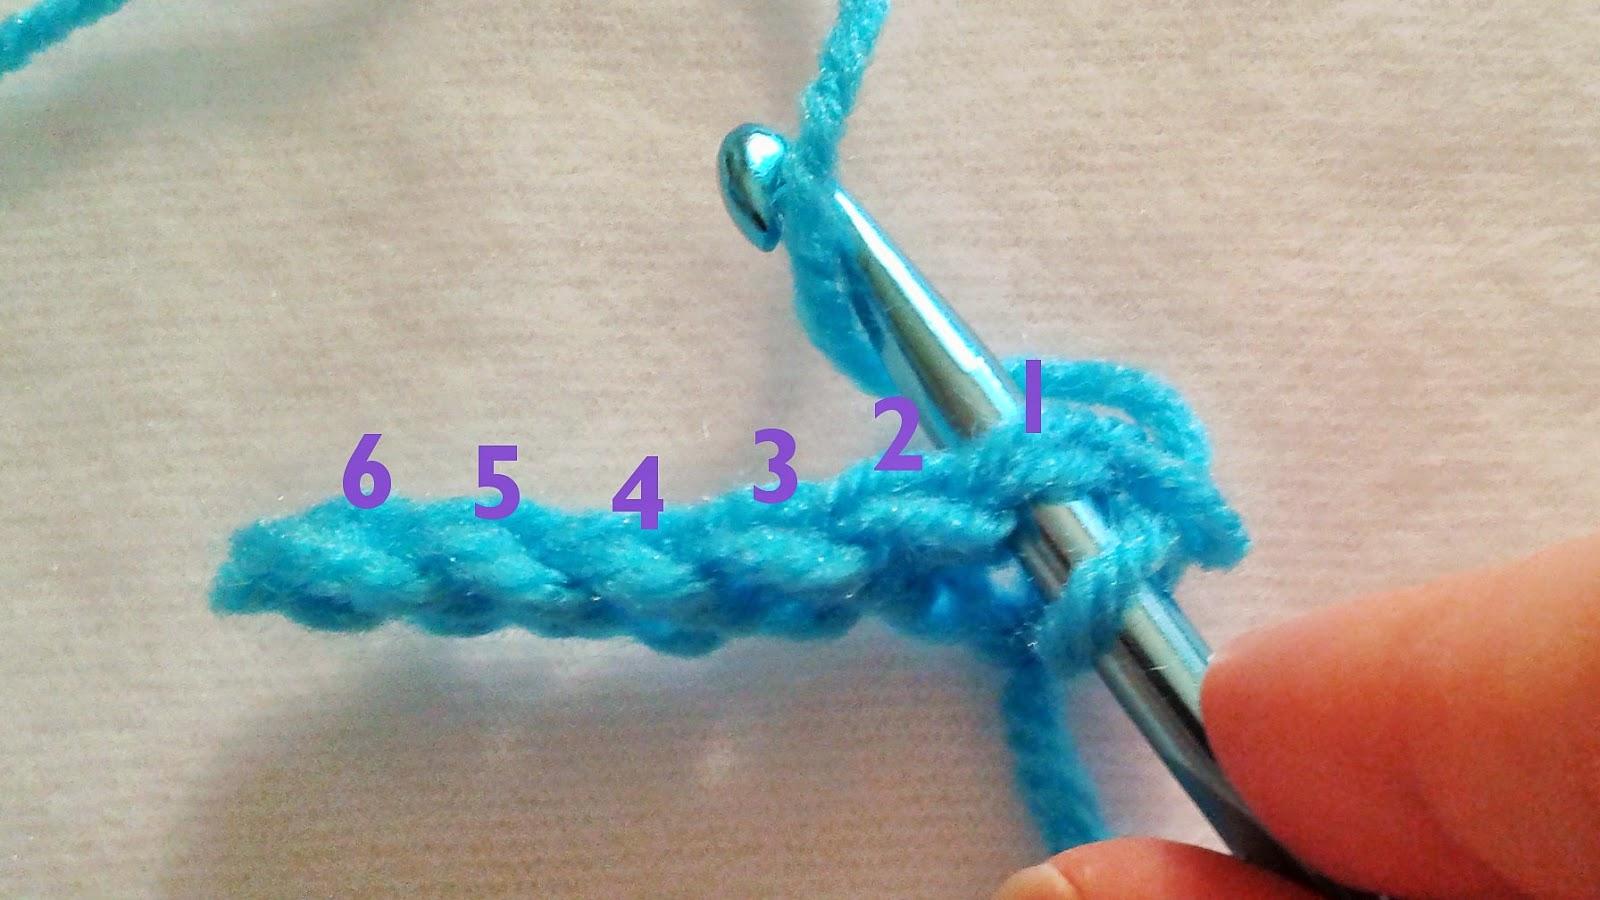 Single Crochet 7 Counting Single Crochet Stitches 2